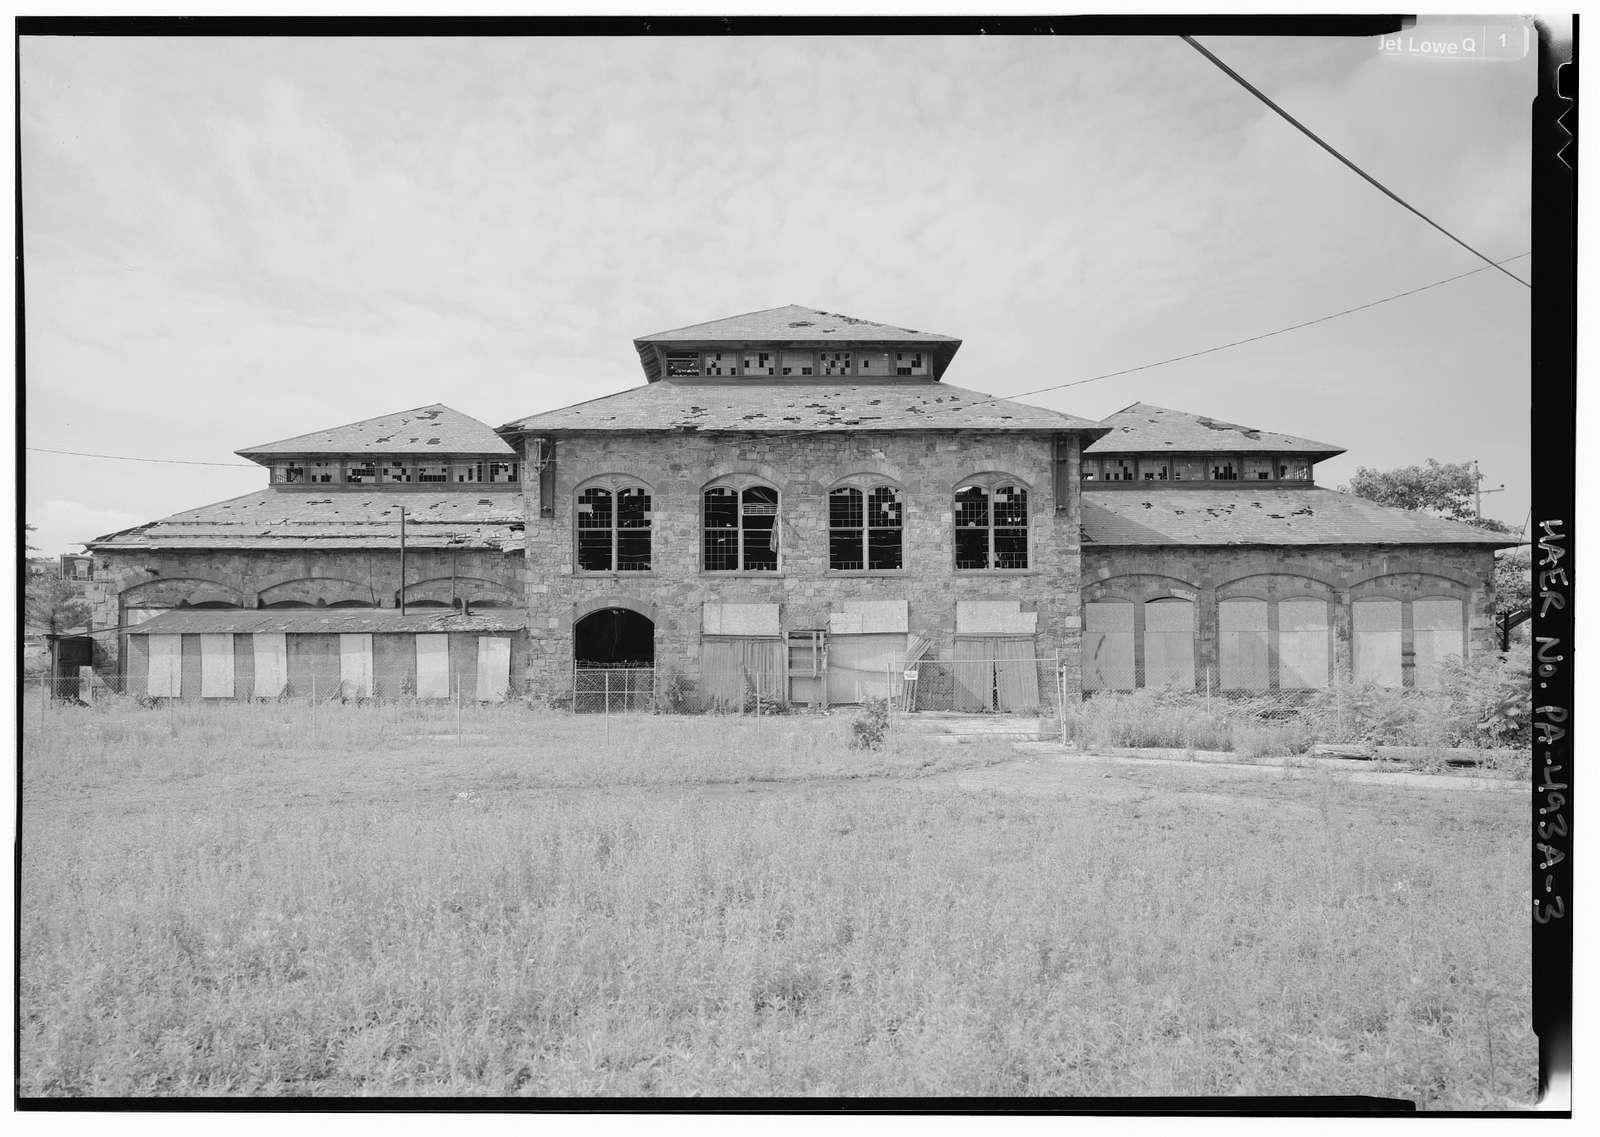 Phoenix Iron Company, Foundry Building, Main Street at Mill Street, Phoenixville, Chester County, PA